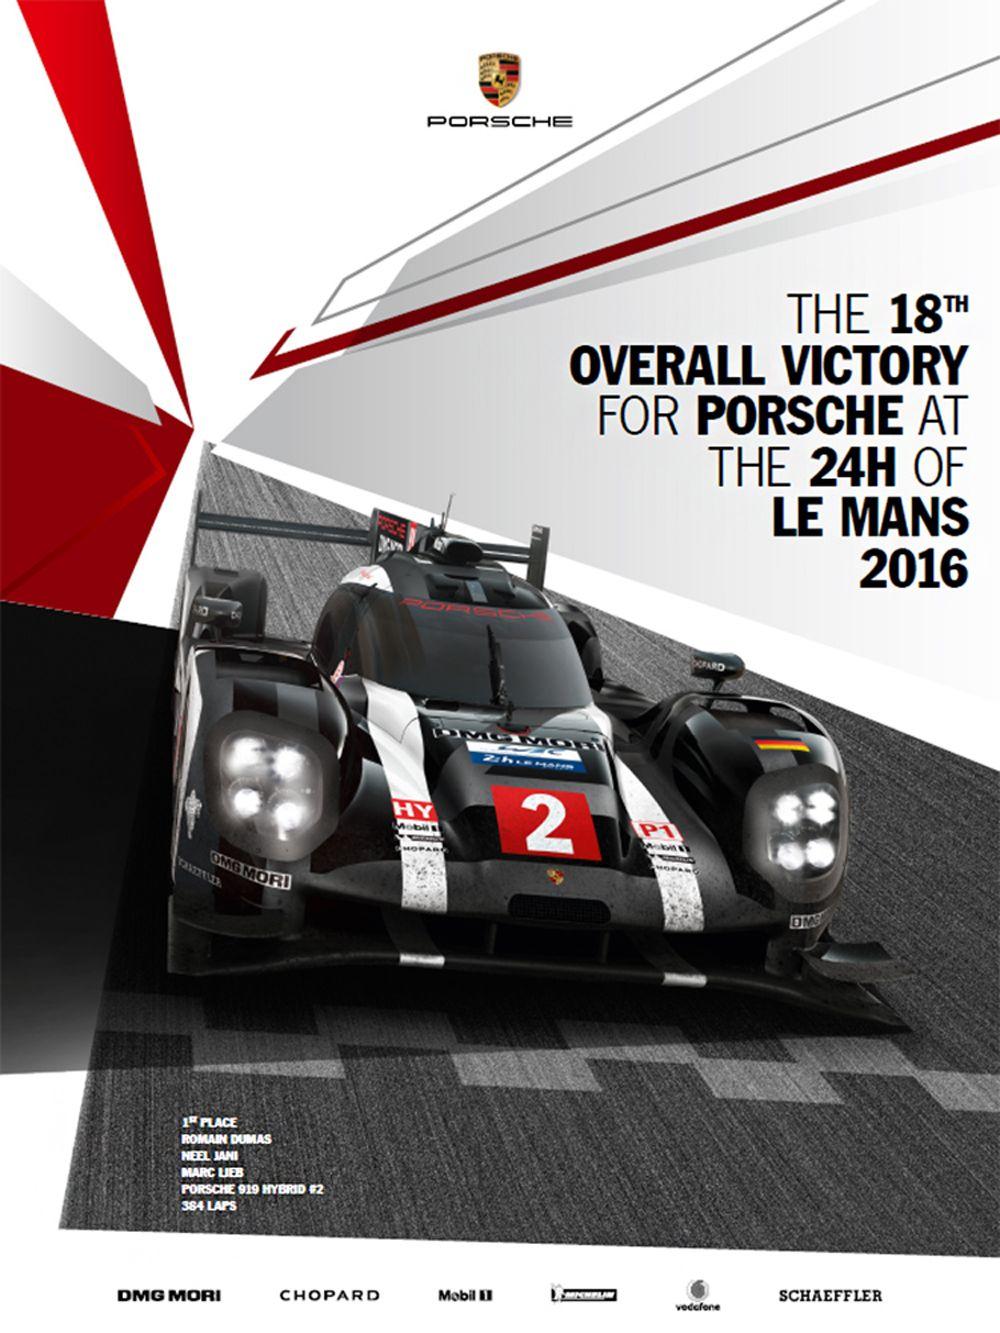 20 - PORSCHE Winning-poster_2016_Le-Mans_m